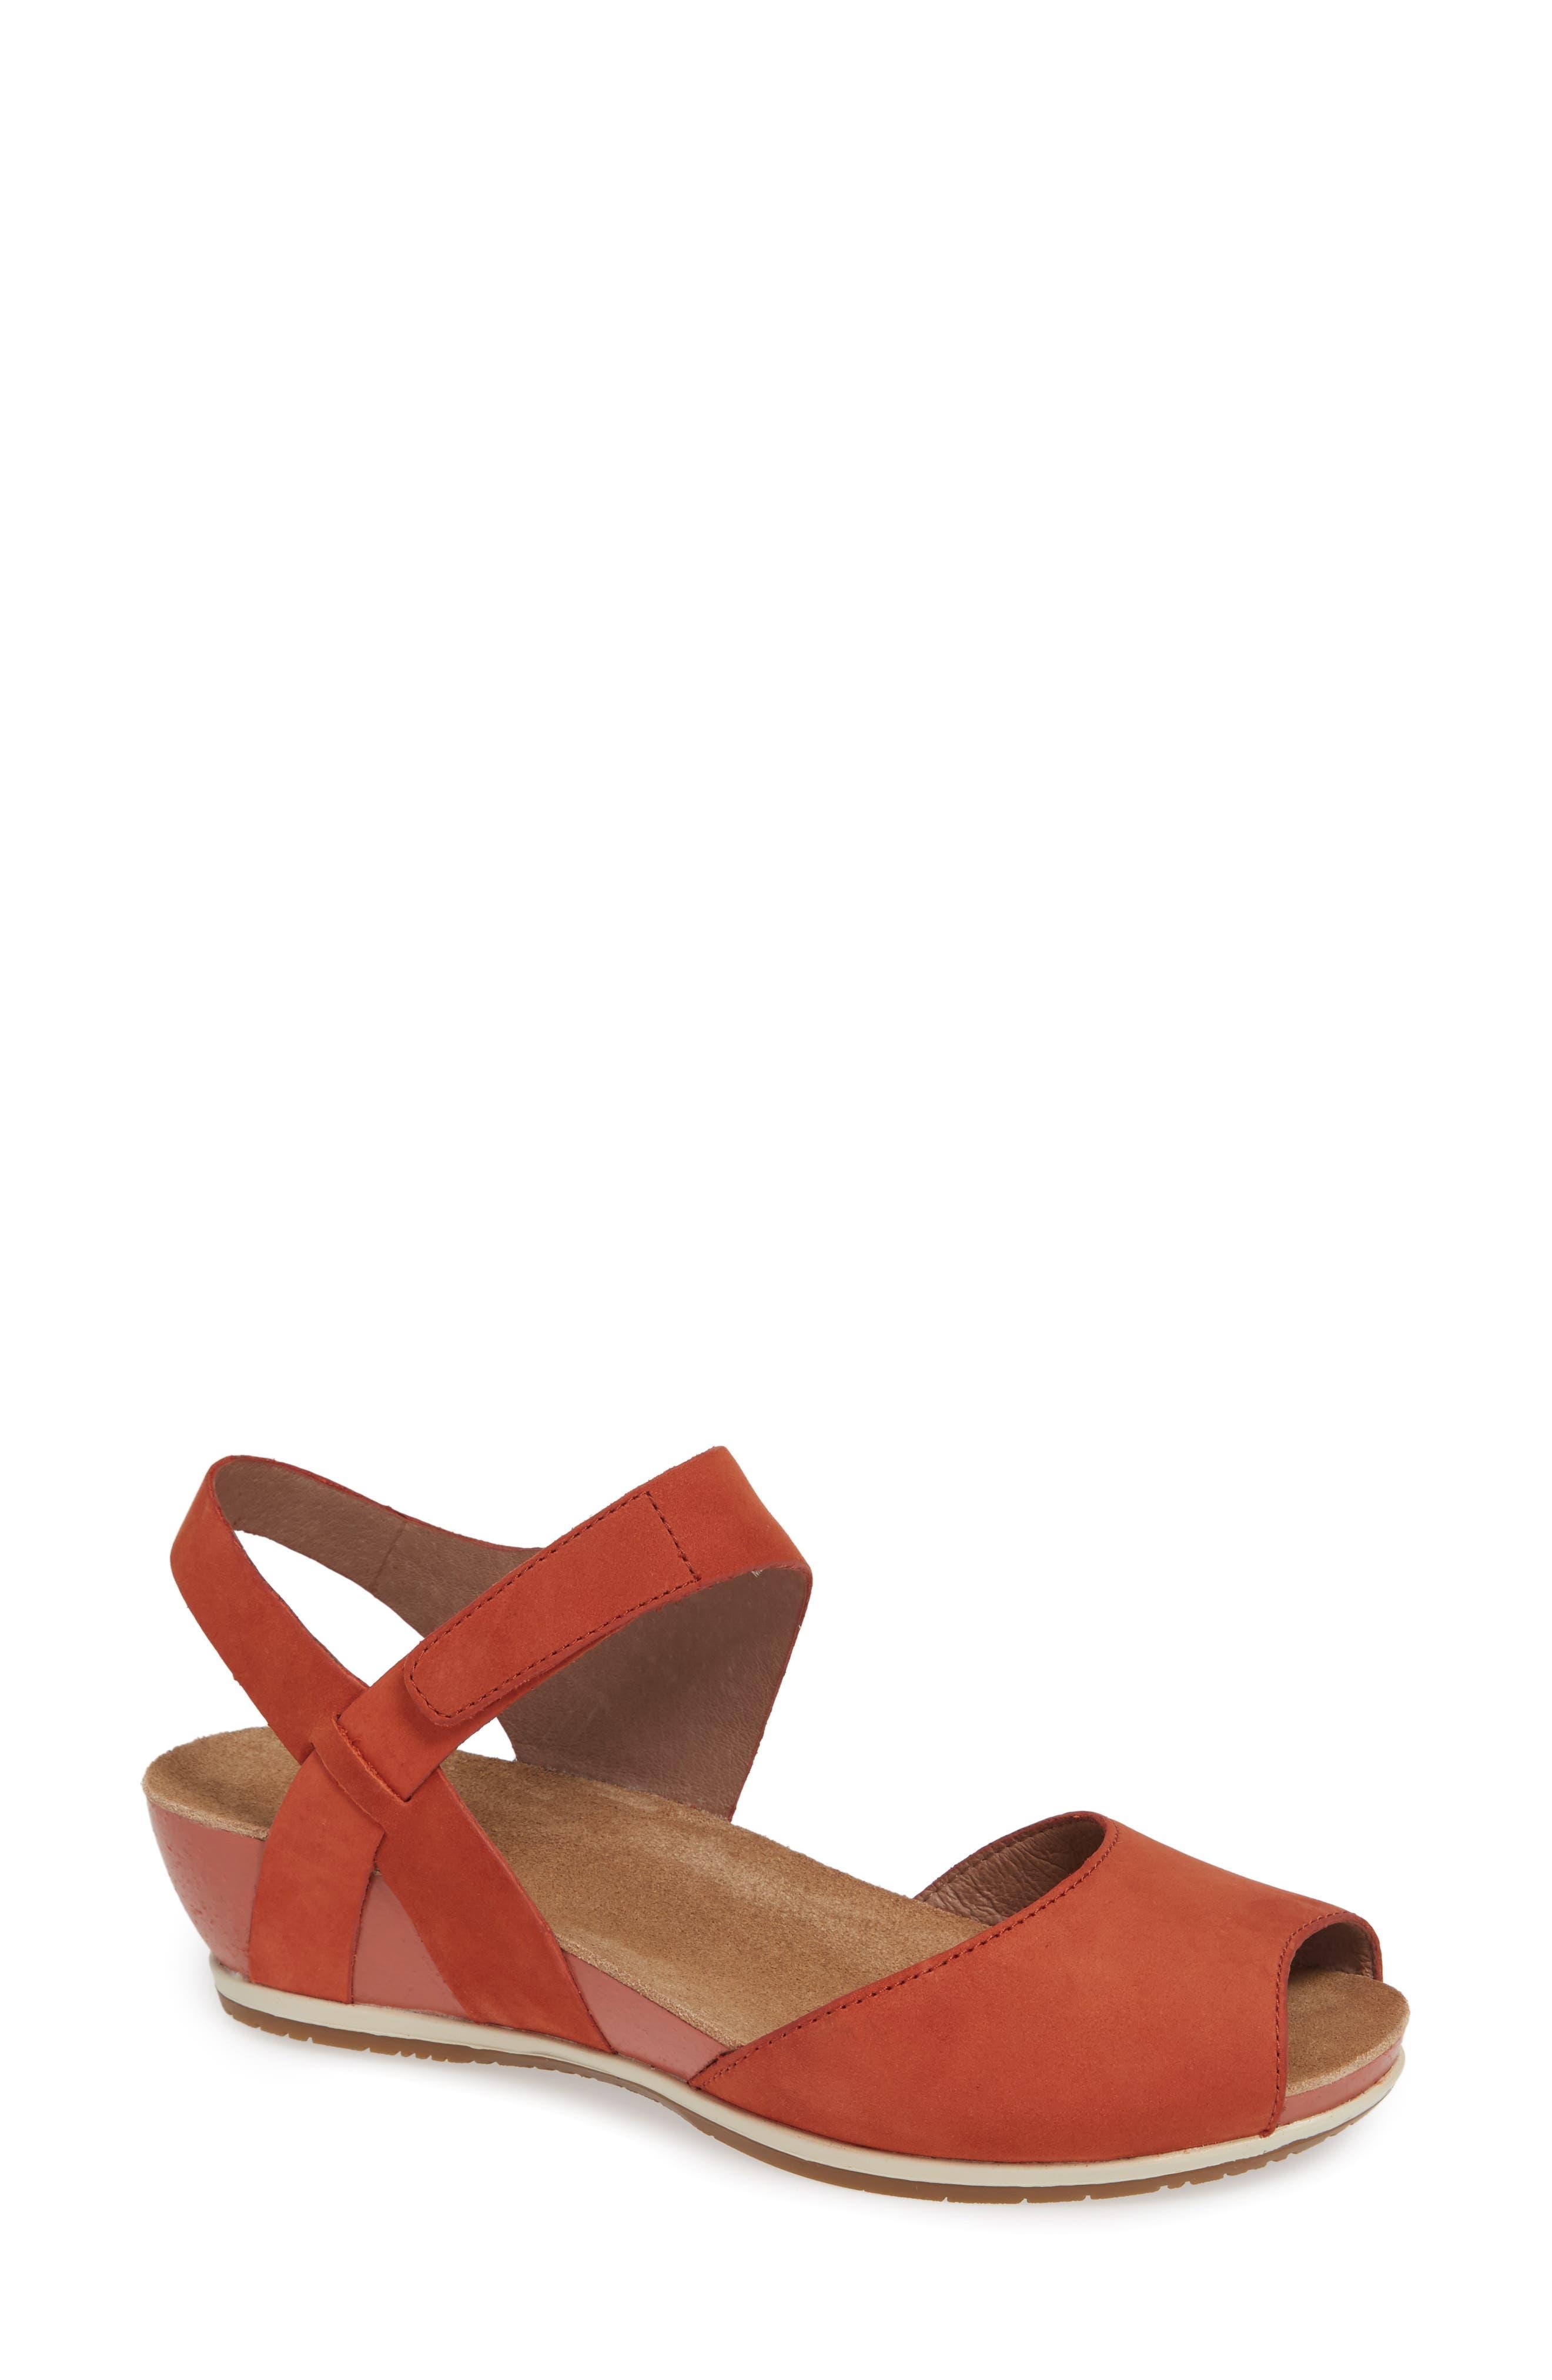 a7a133c3167c Dansko vera sandal main color coral nubuck leather jpeg 780x838 Dansko vera  sandals